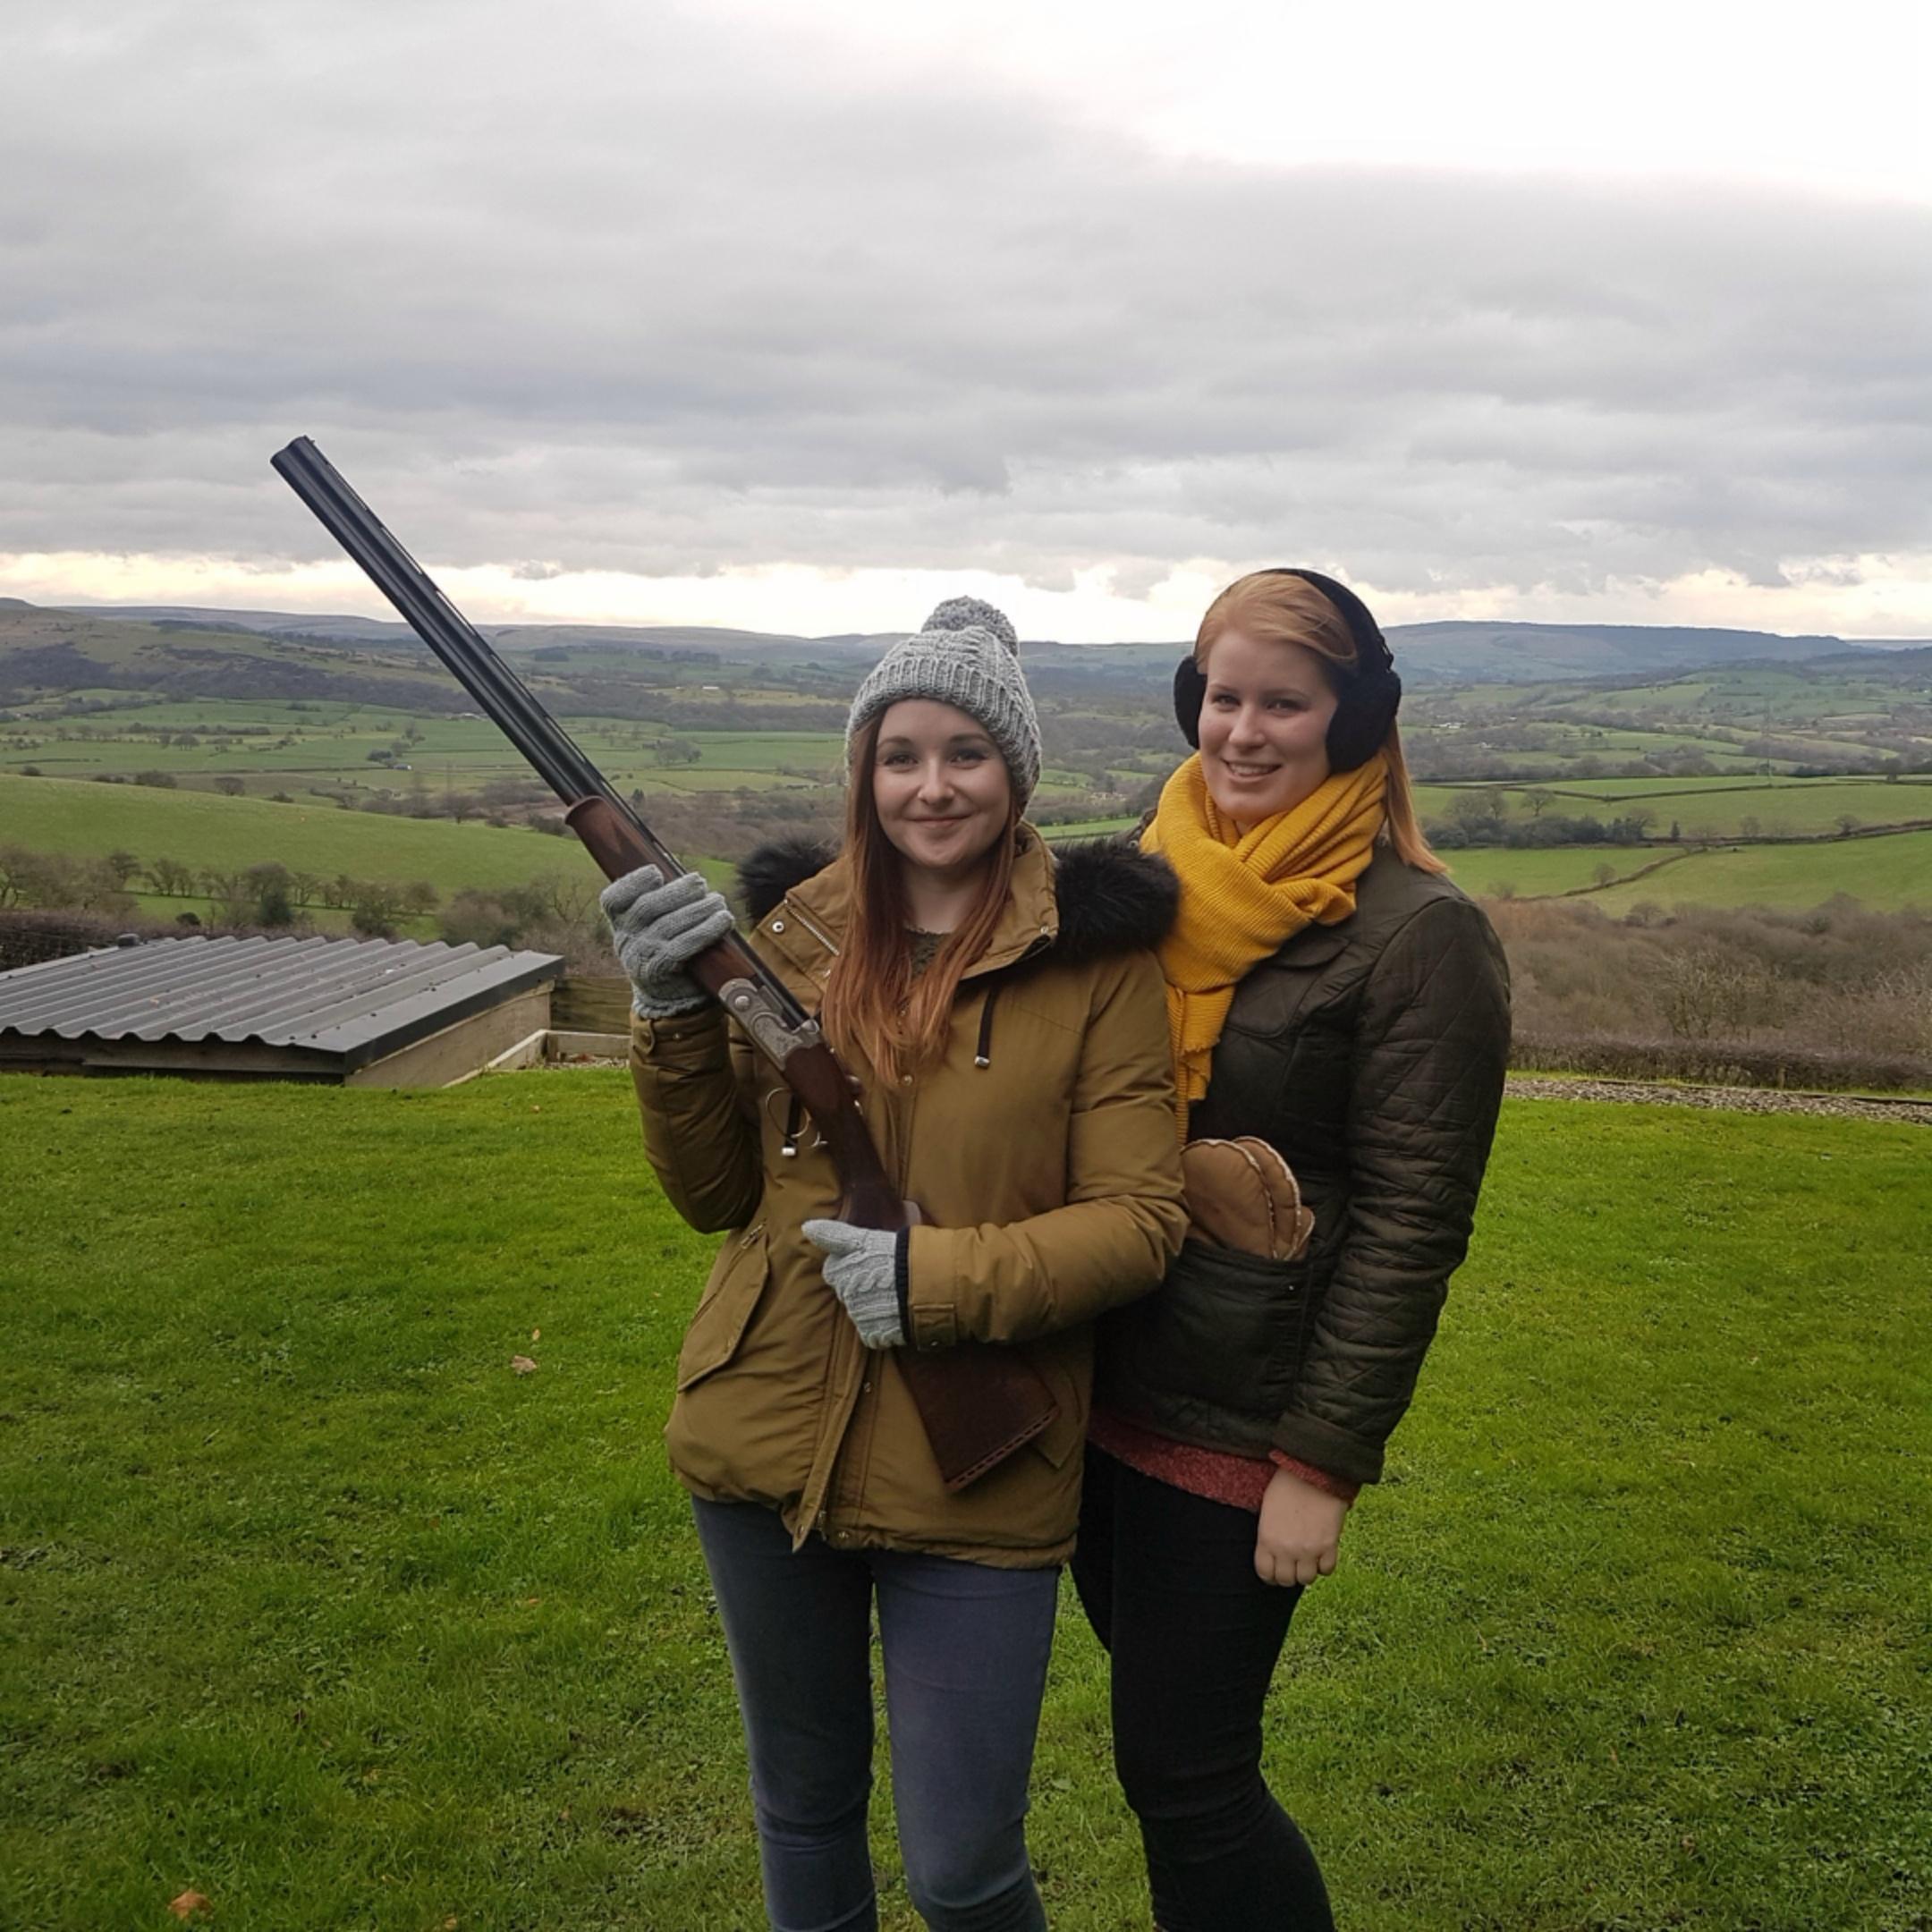 Jen & Ellen visit Cheshire's Finest Shooting Ground